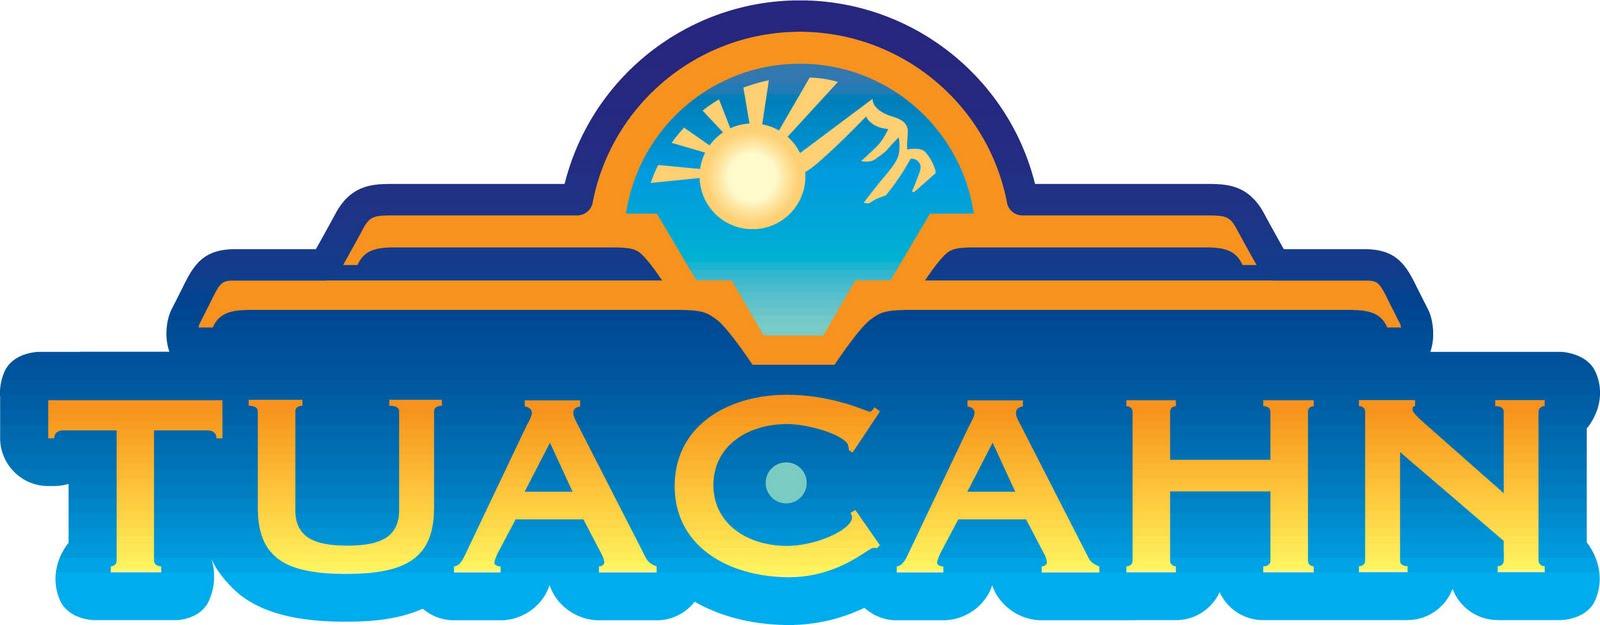 Tuacahn Amphitheater Logo - Utah's Best Vacation Rentals